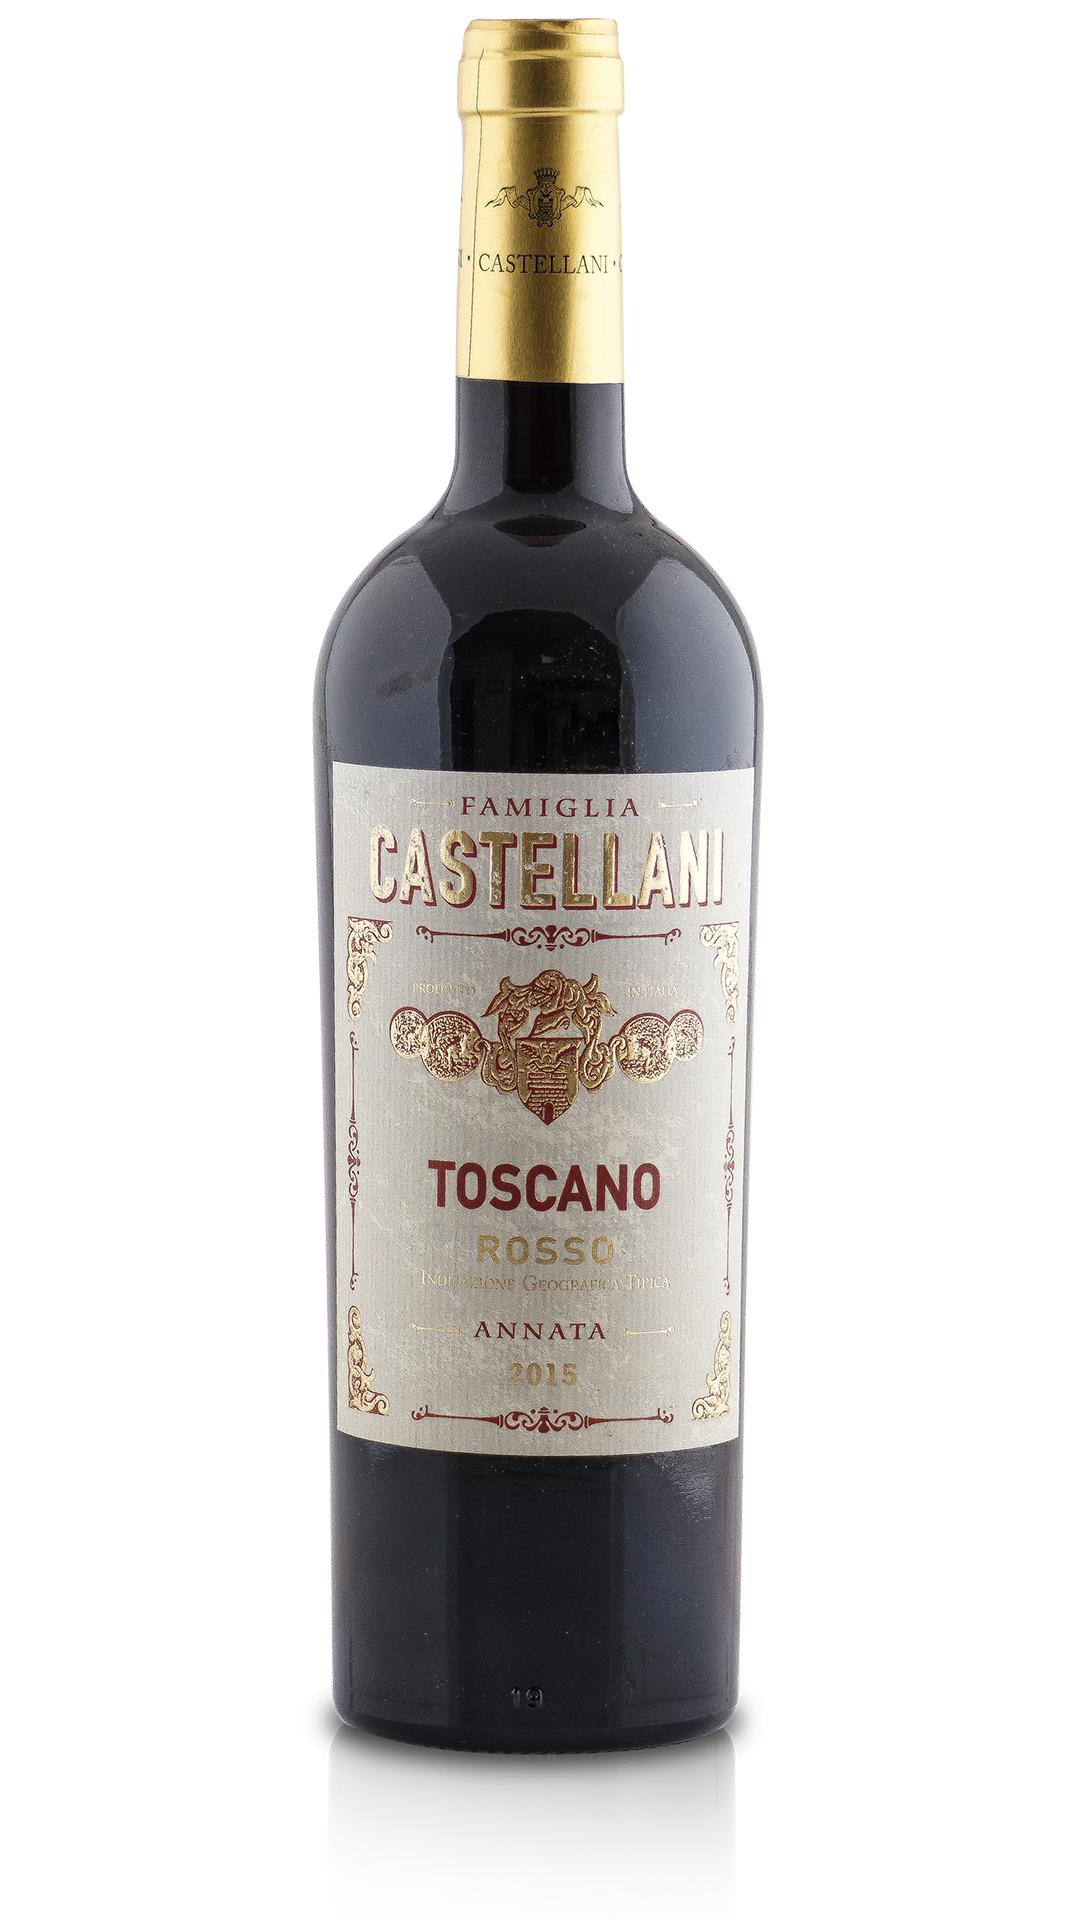 toscano-fam-castellani-inside-section